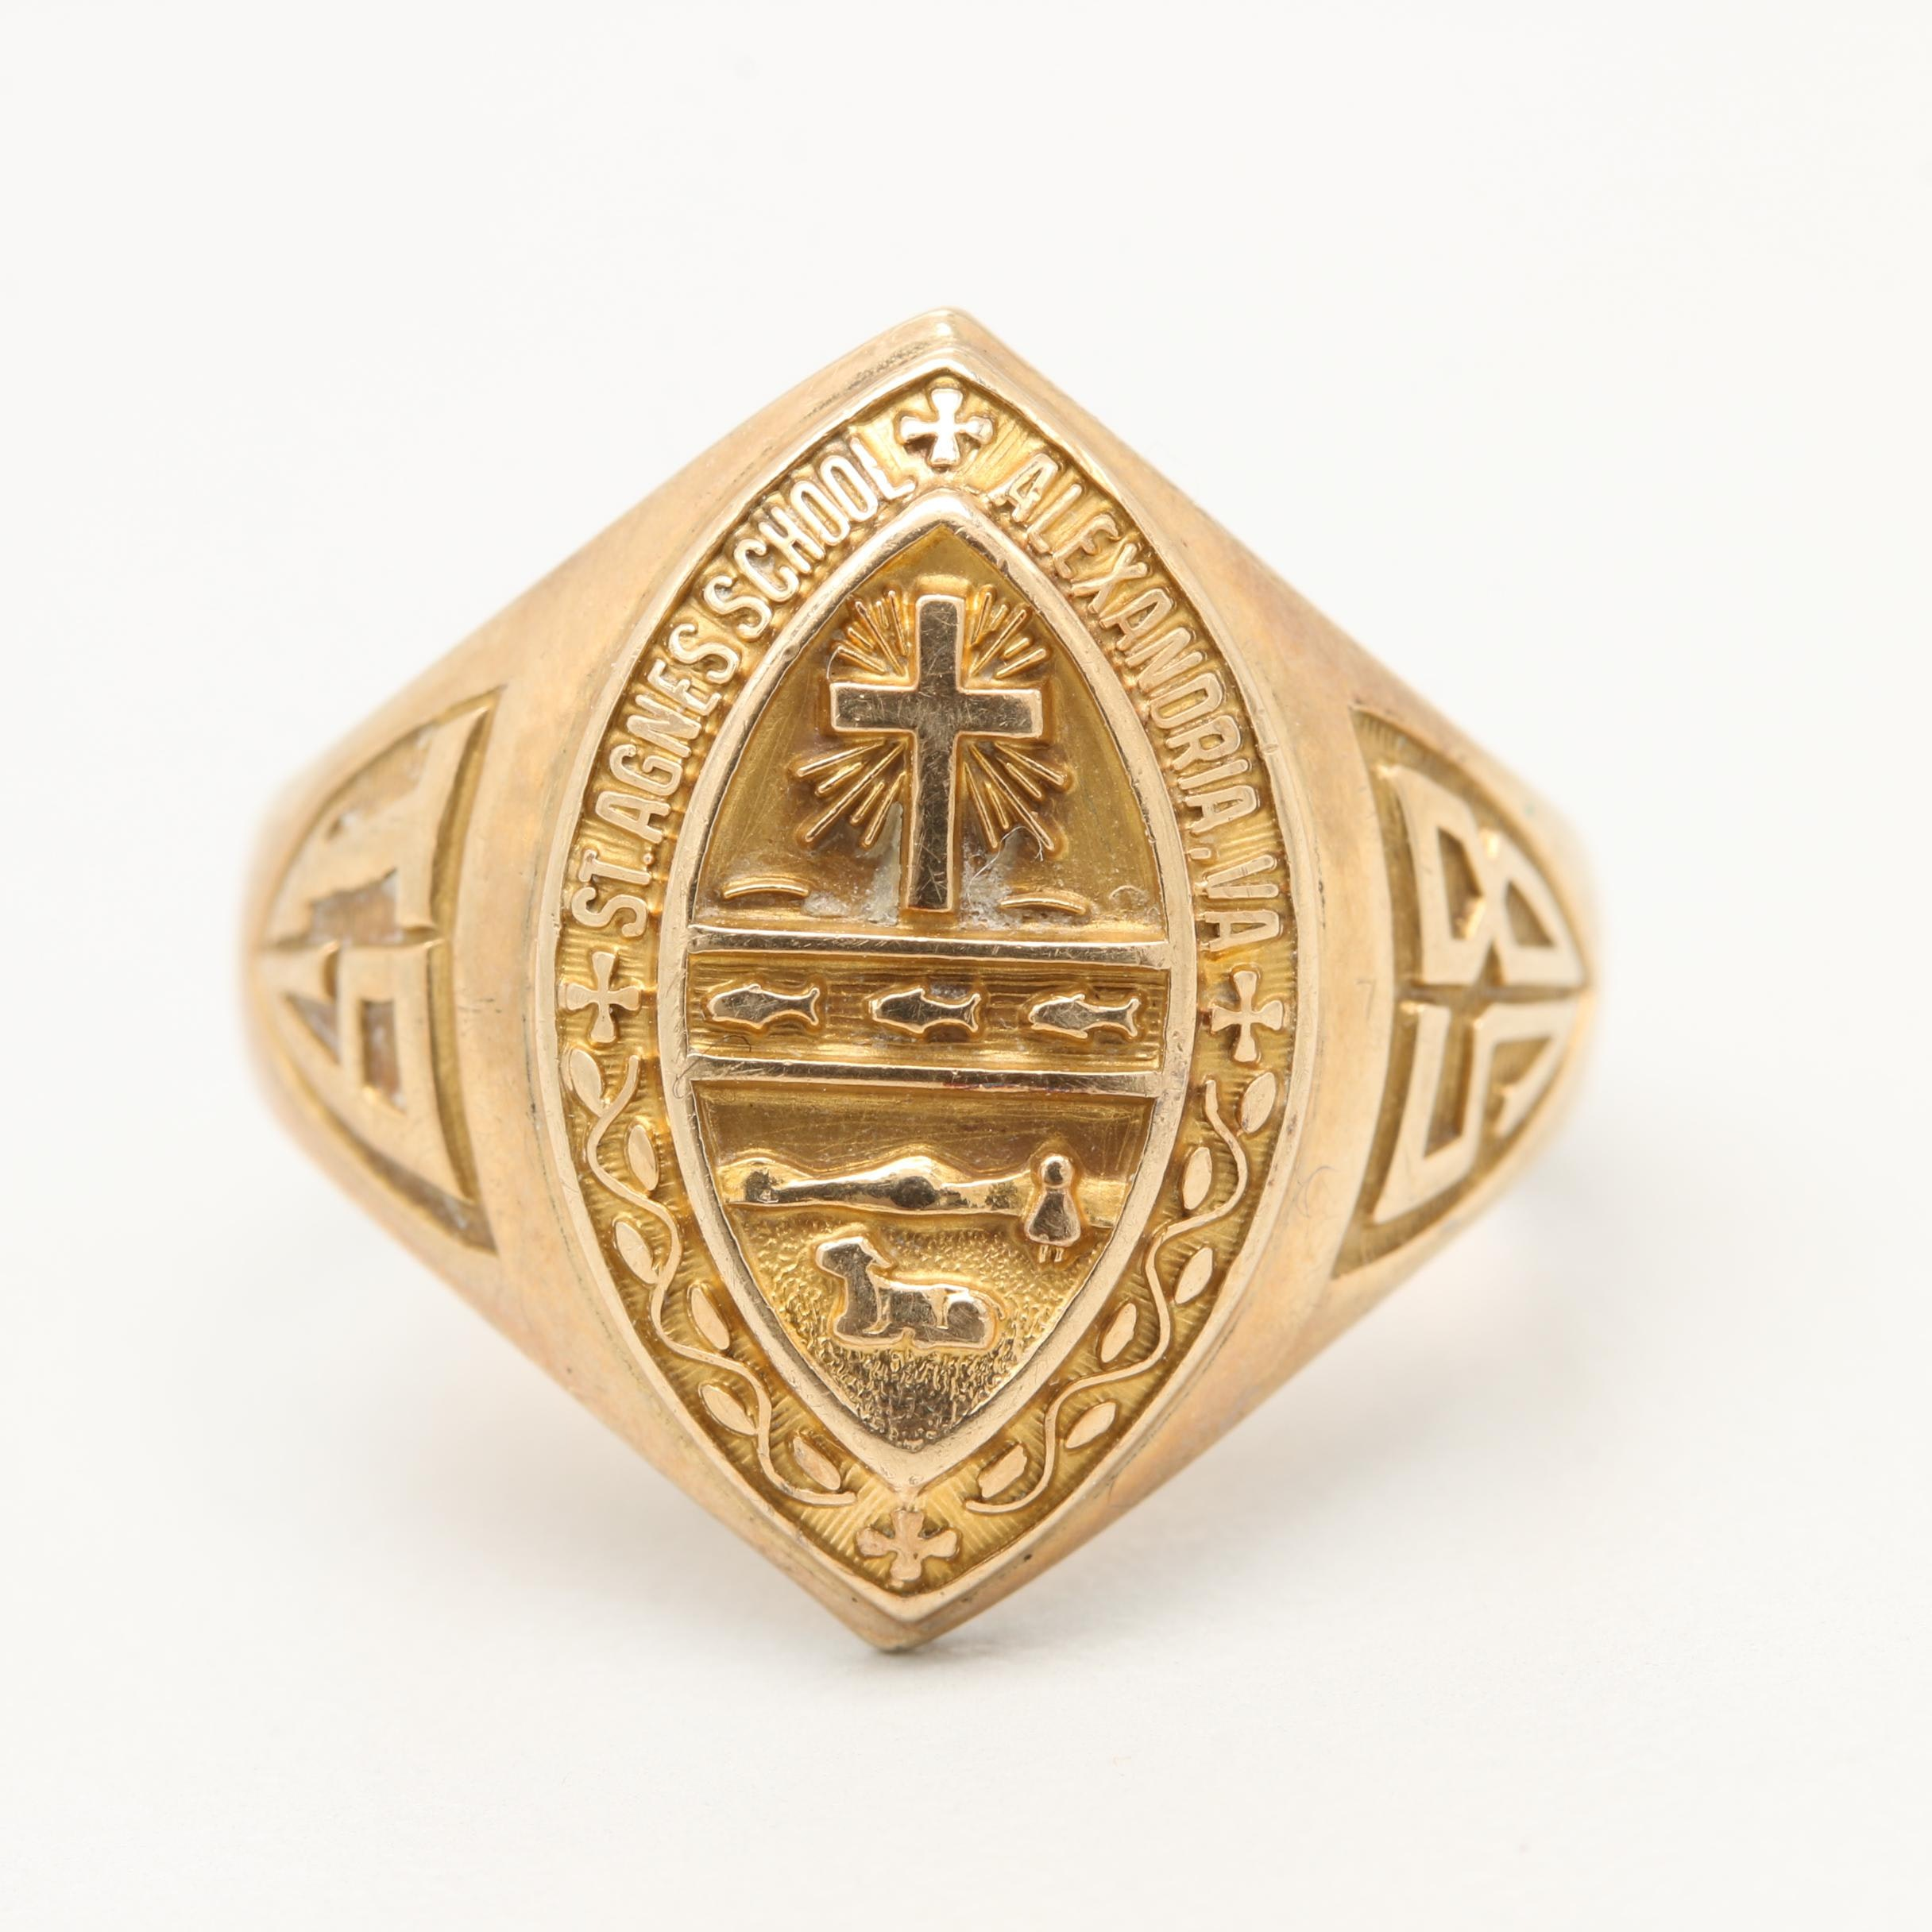 Circa 1958 10K Yellow Gold Class Ring